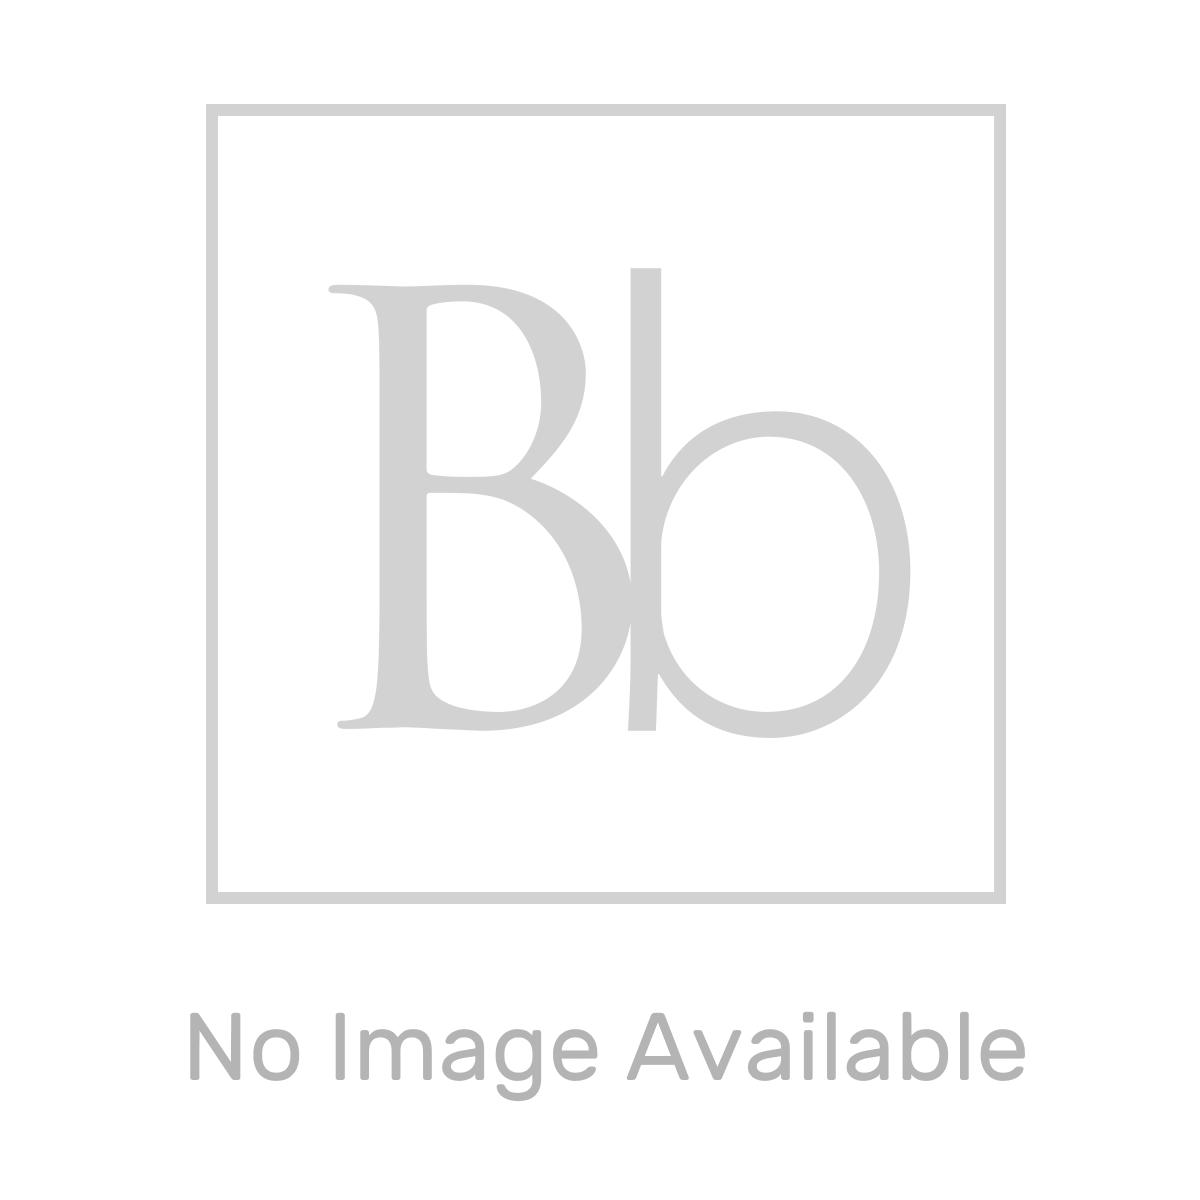 April Rectangular Anti Slip Shower Tray 1000 x 760 Line Drawing